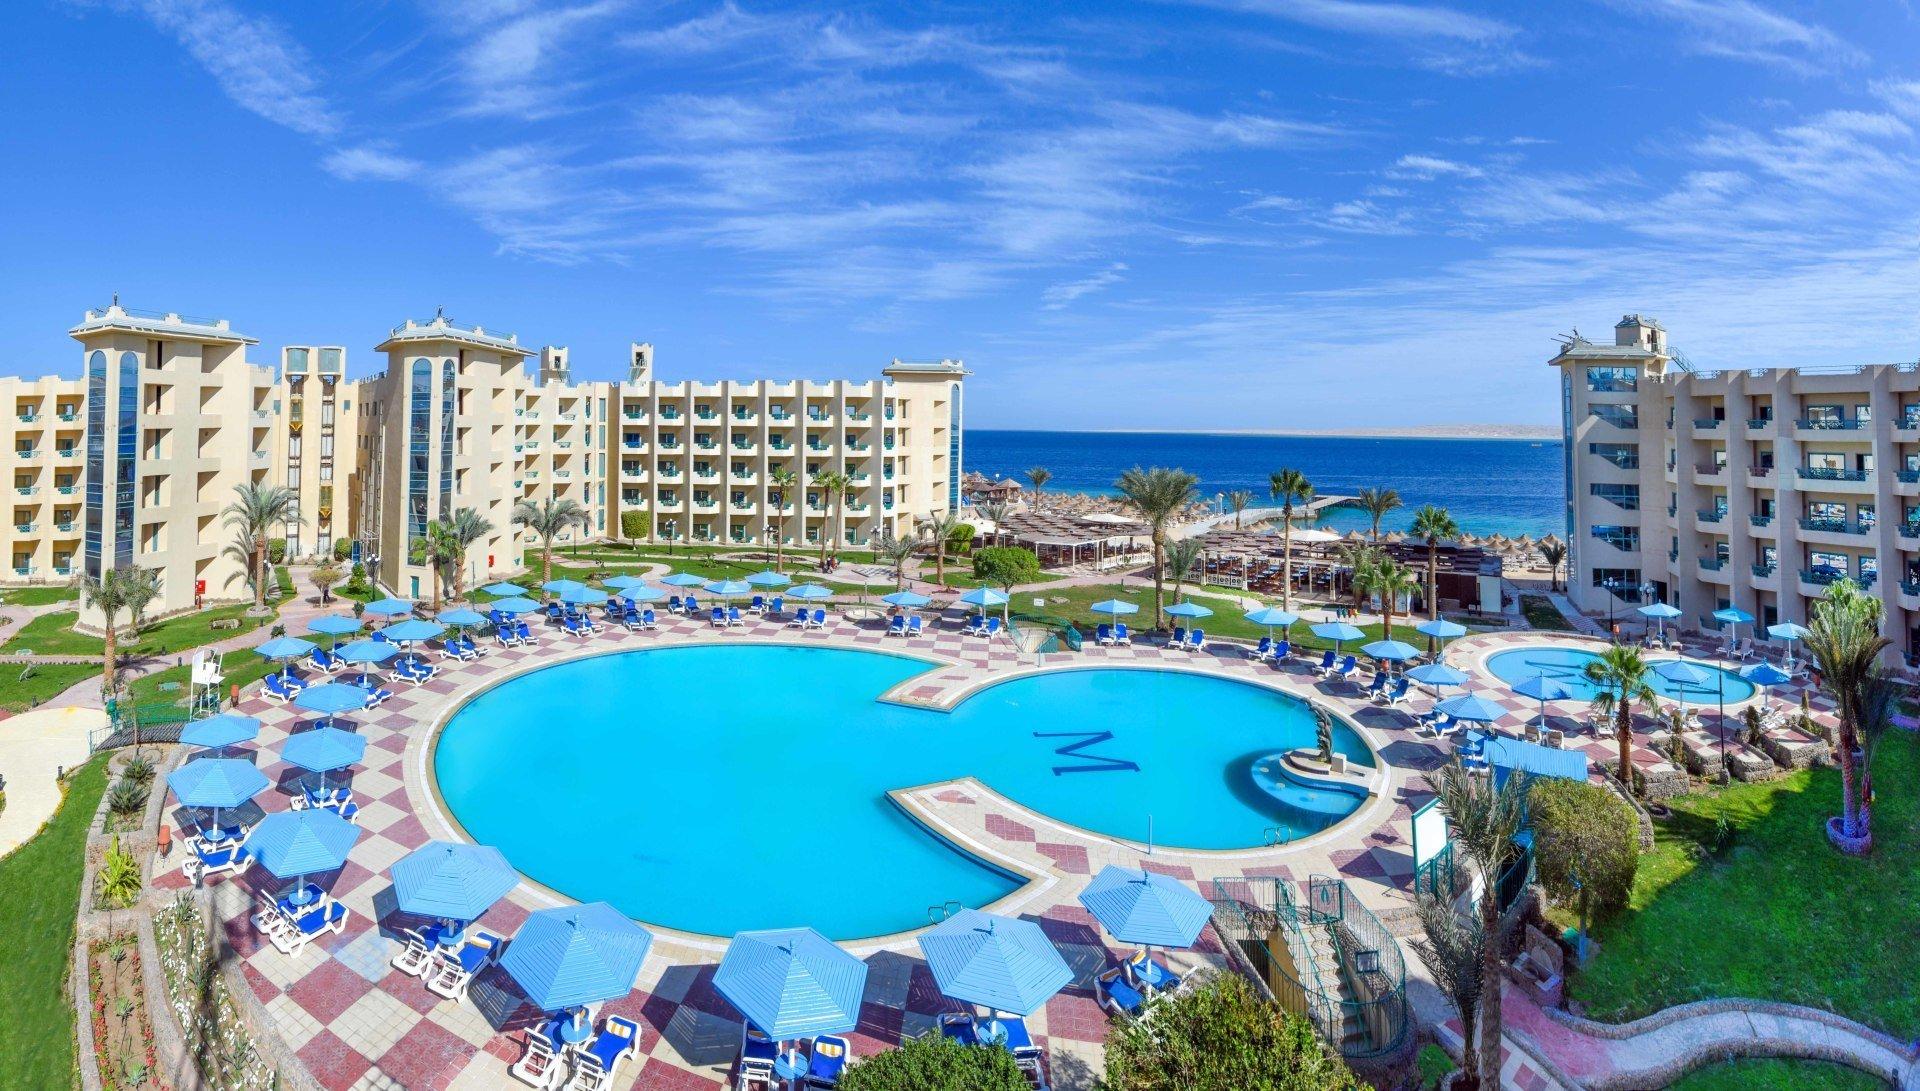 Bequia Beach Hotel Luxury Resort & Spa - Honeymoon Goals